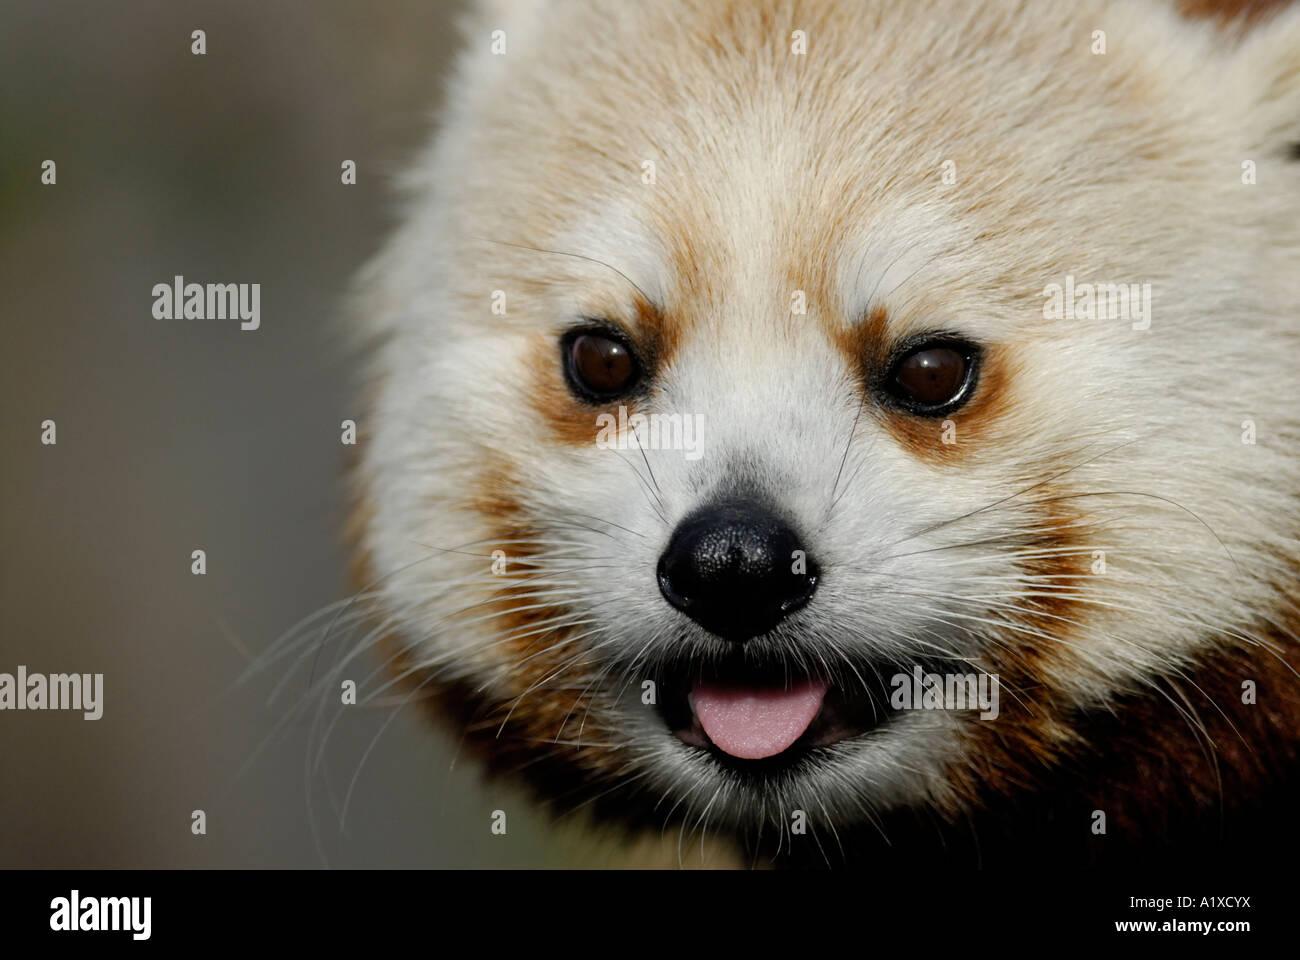 'Red panda', Ailurus fulgens, Close up of face Photo Stock